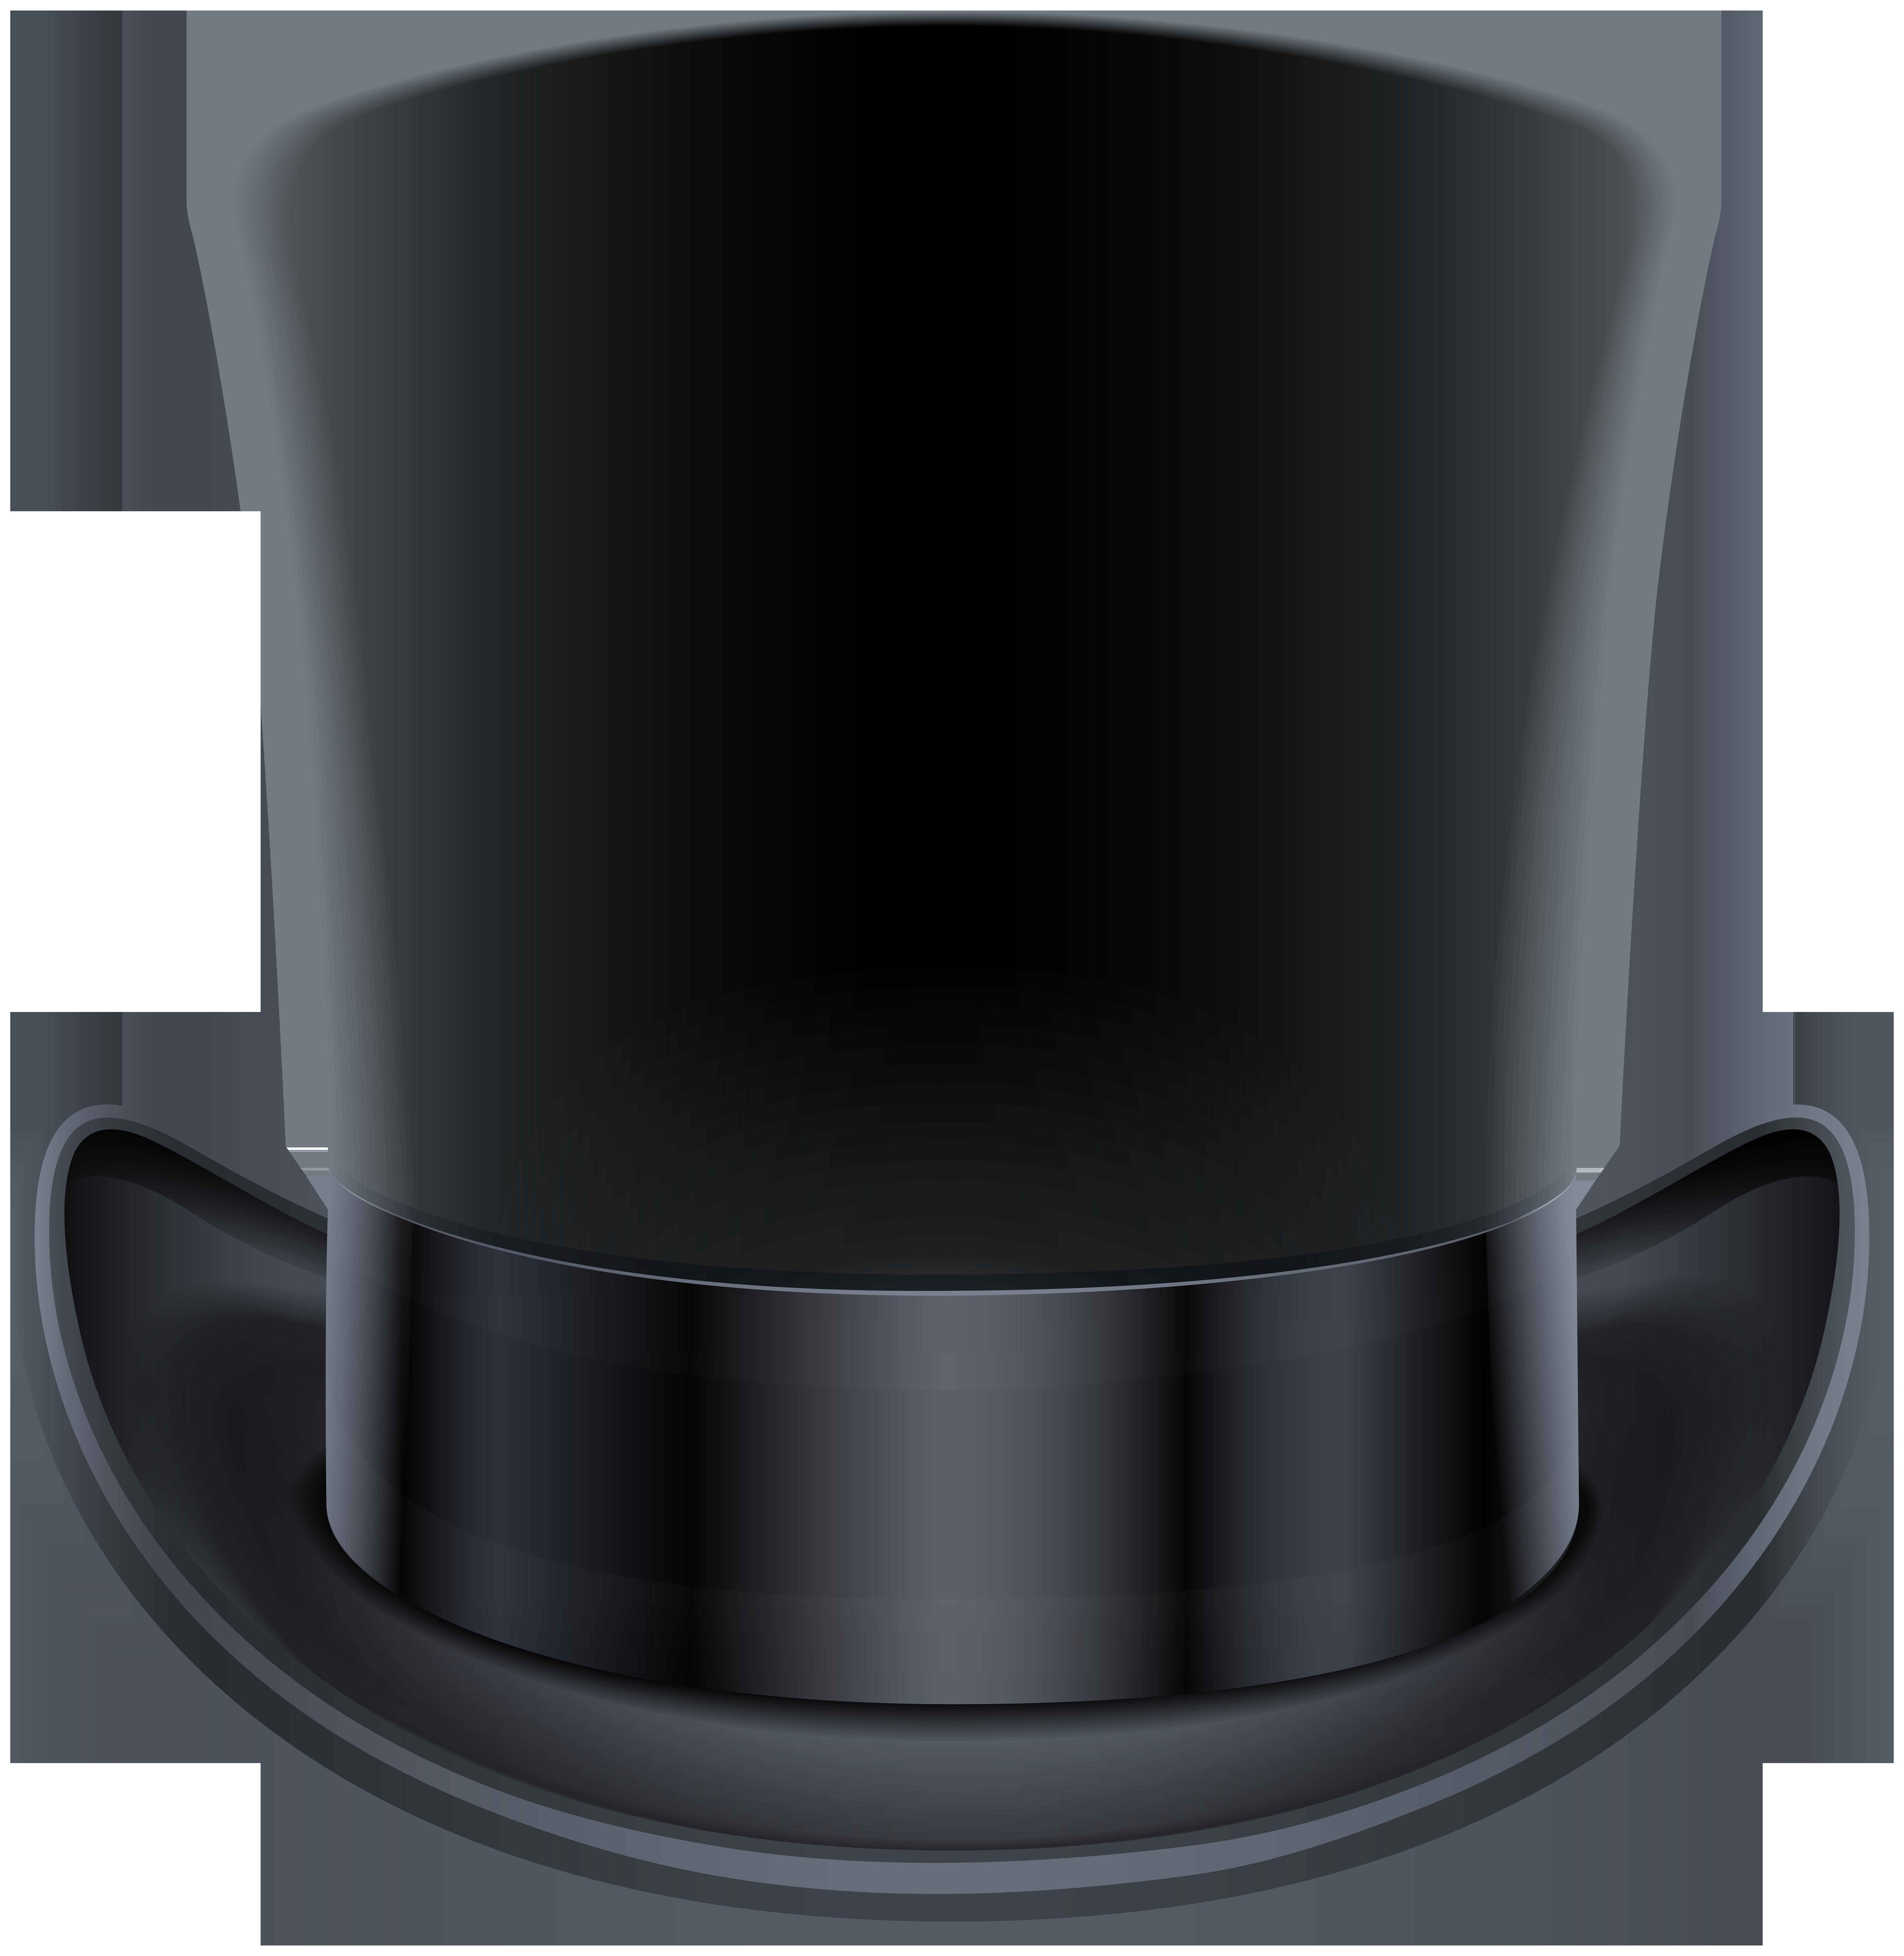 Top Hat Black PNG Clip Art Image.